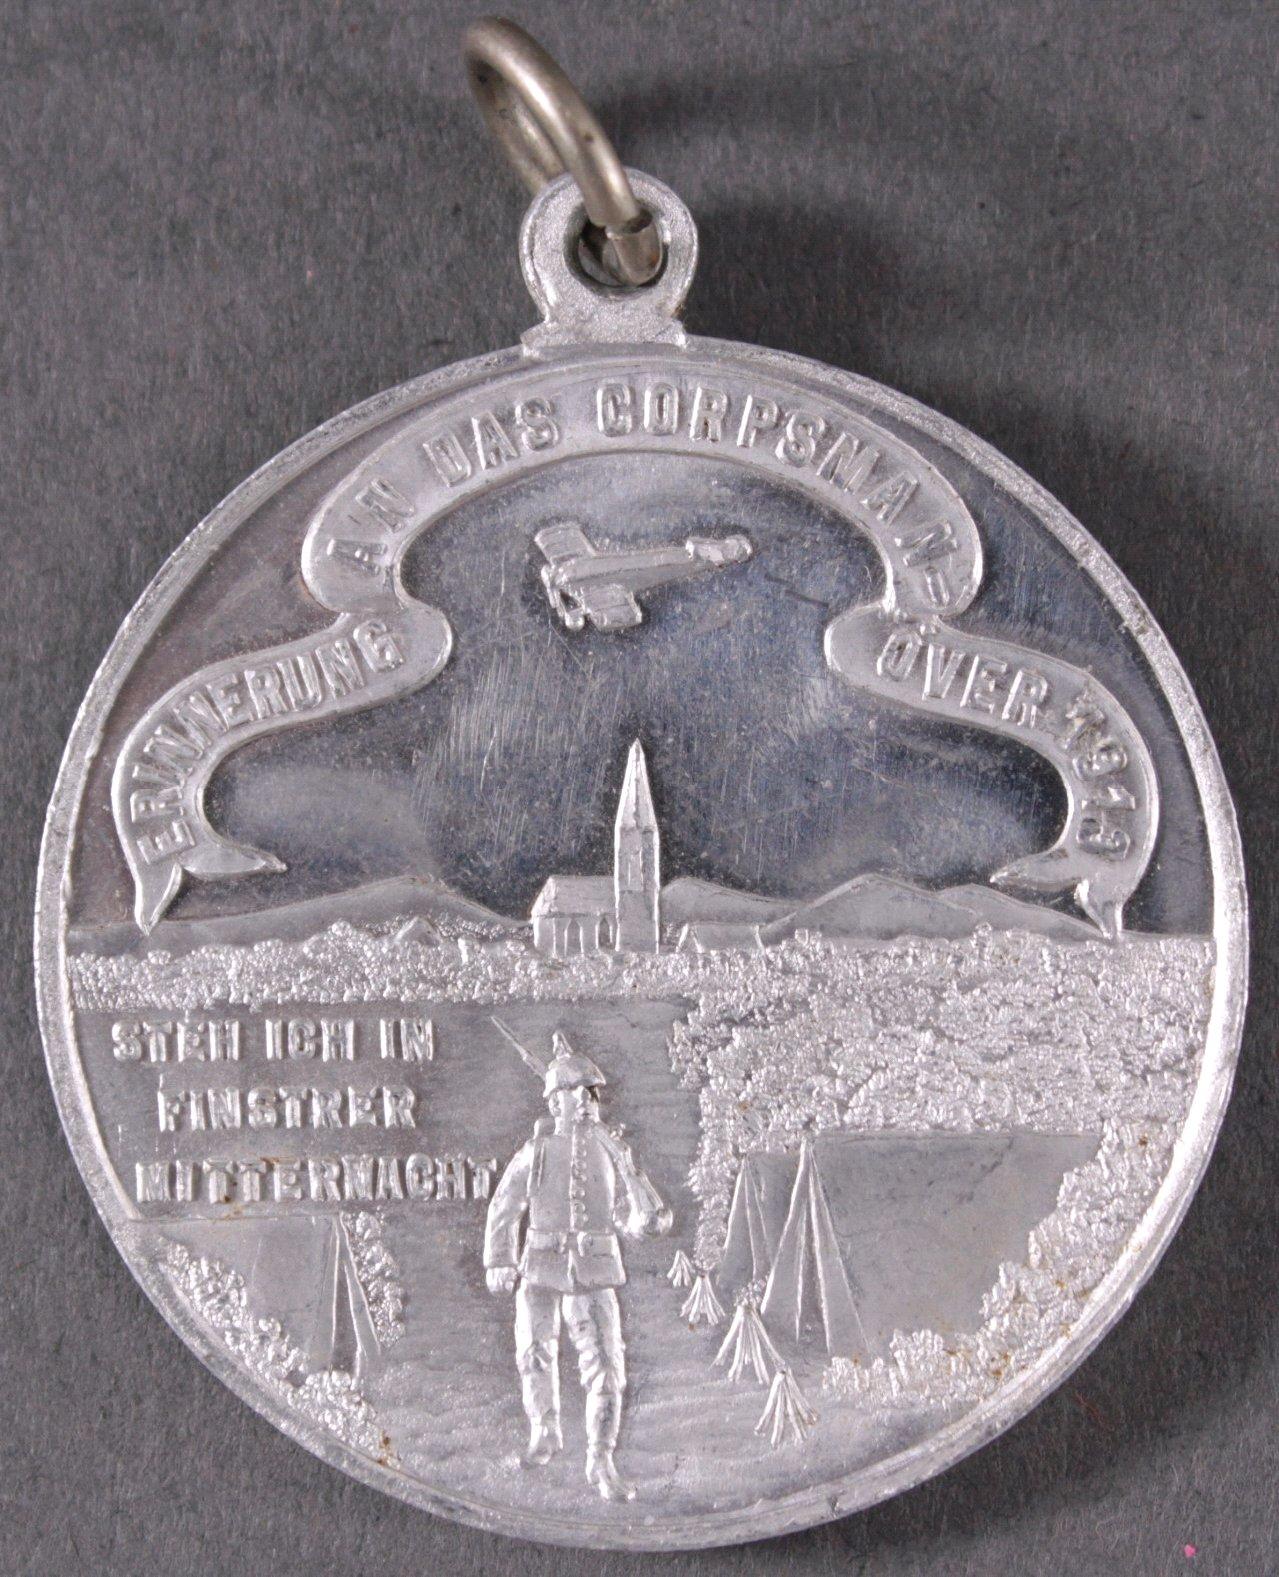 Aluminiummedaille, Corpsmanöver 1913 mit Flugzeug-1